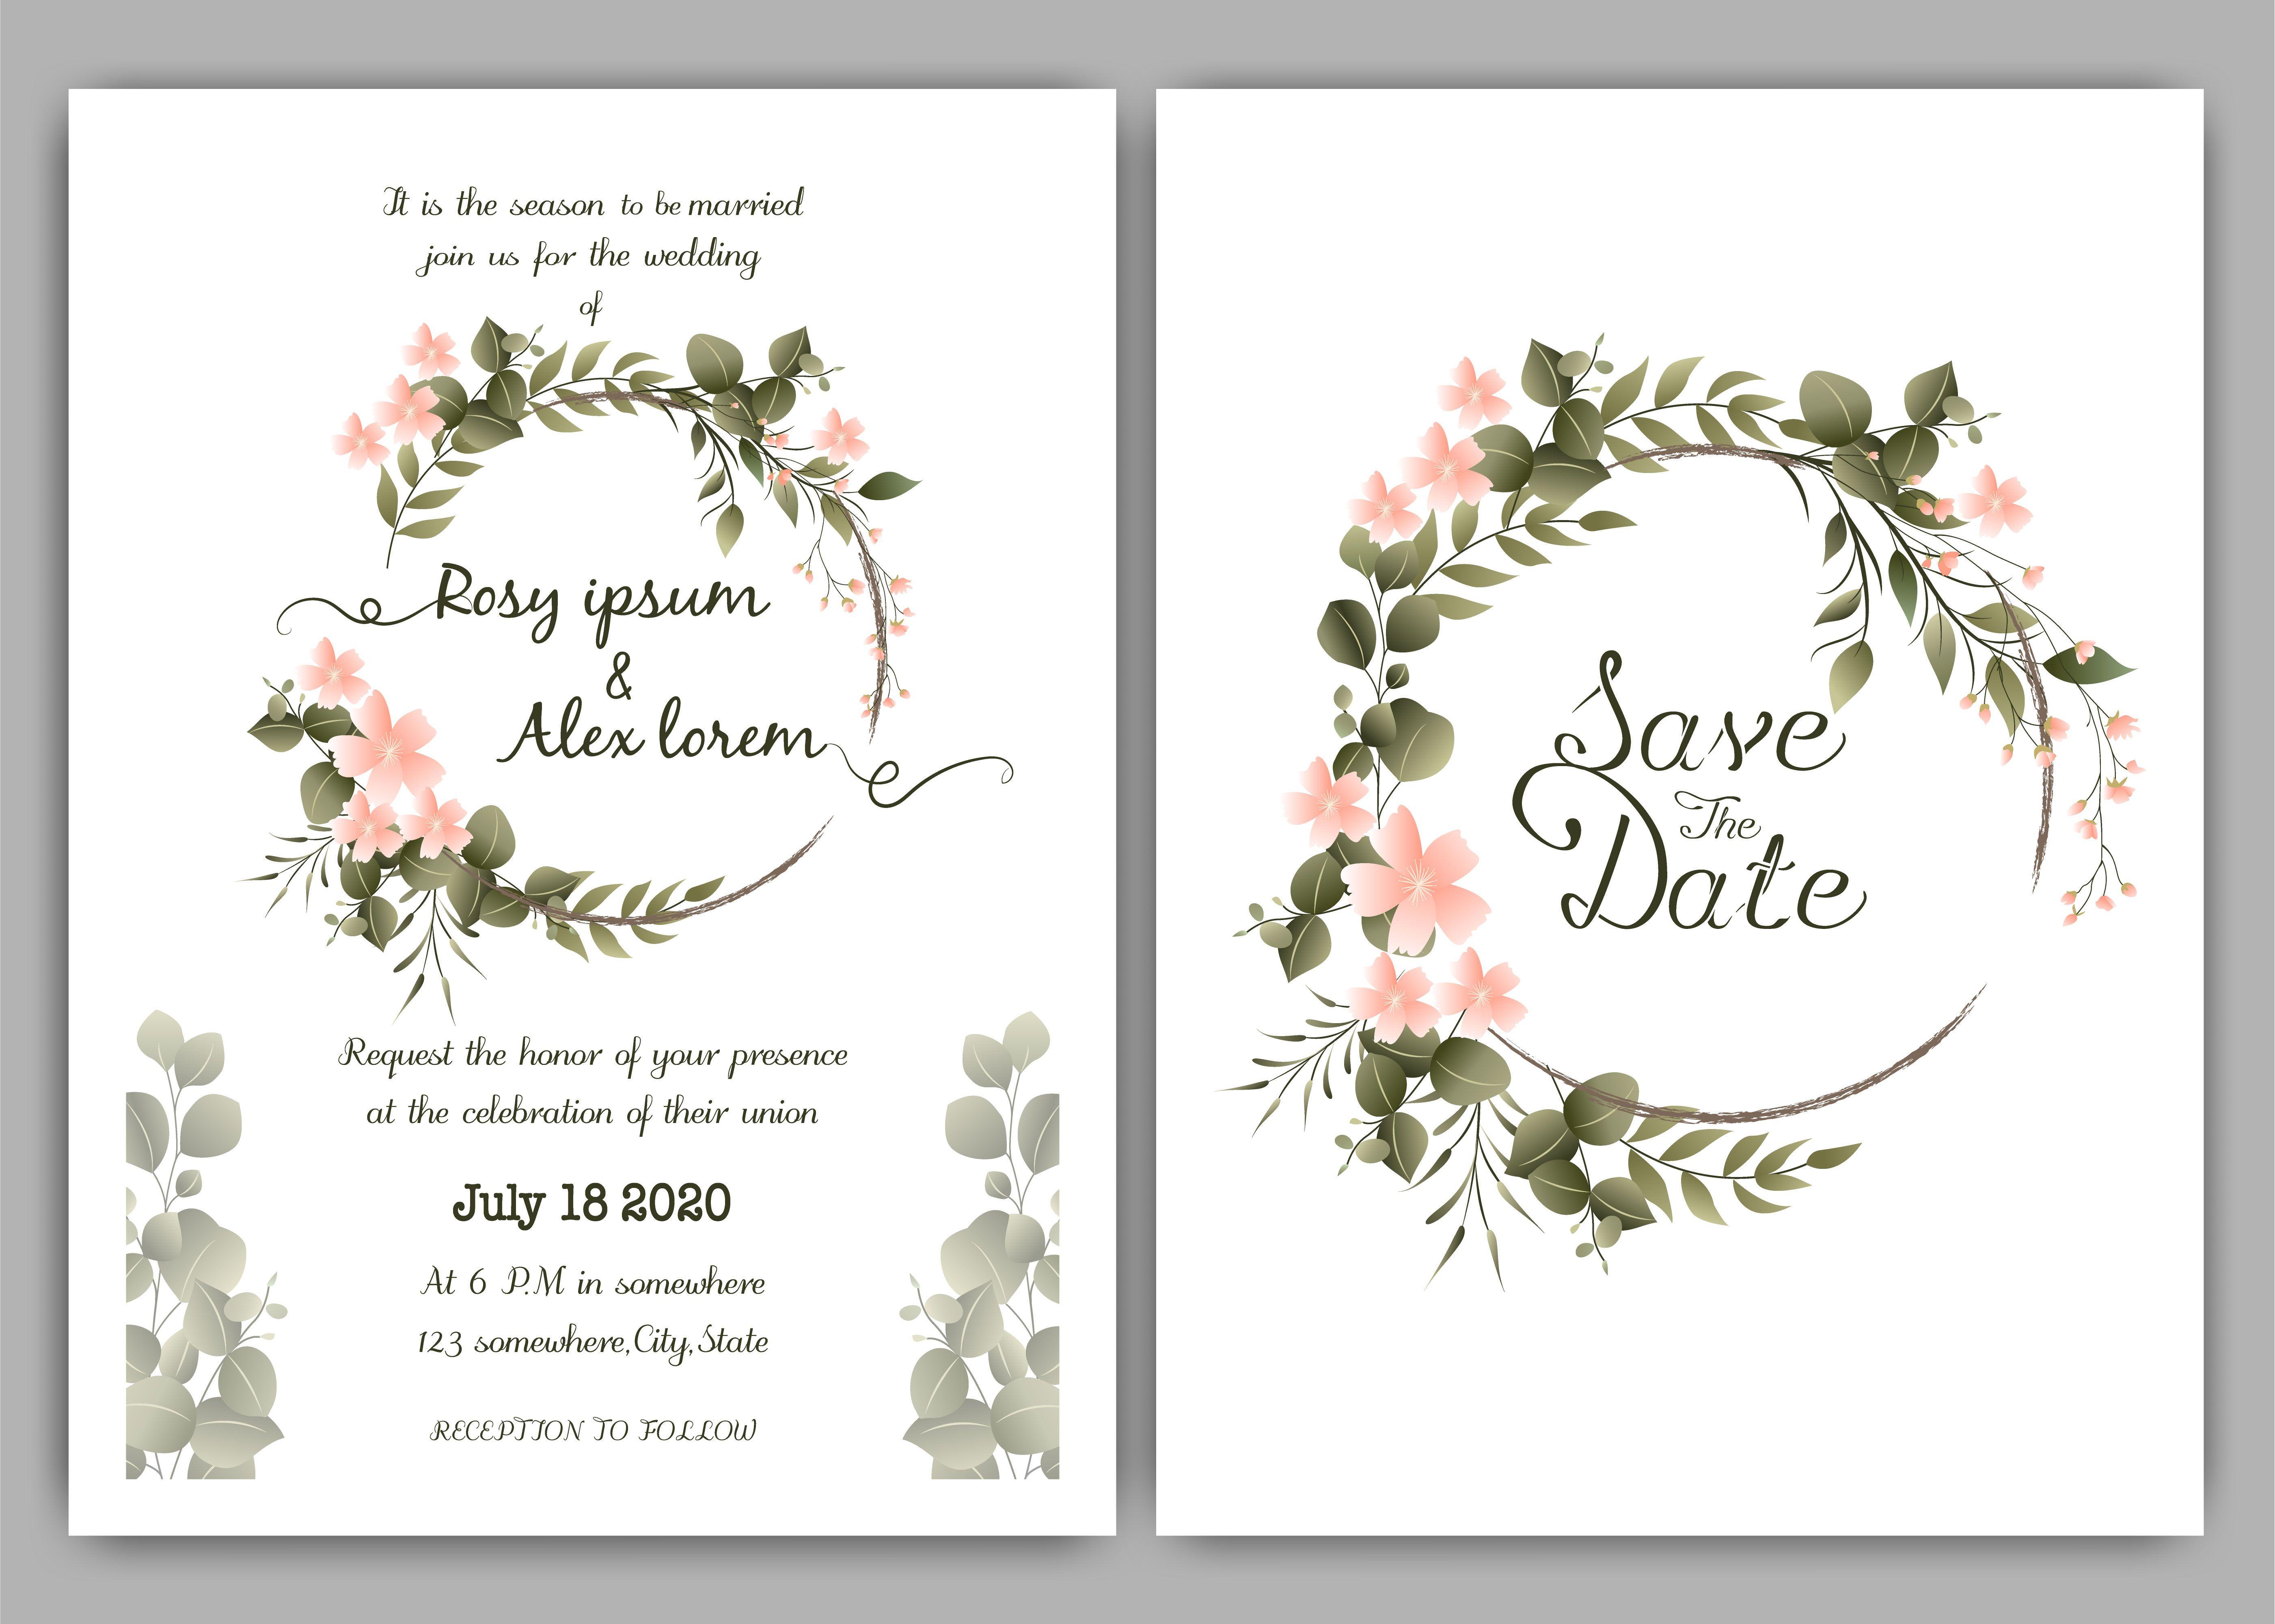 Greenery Wedding Invitation Template Eucalyptus Wedding Invitati Watercolor Floral Wedding Invitations Greenery Wedding Invitations Muslim Wedding Invitations